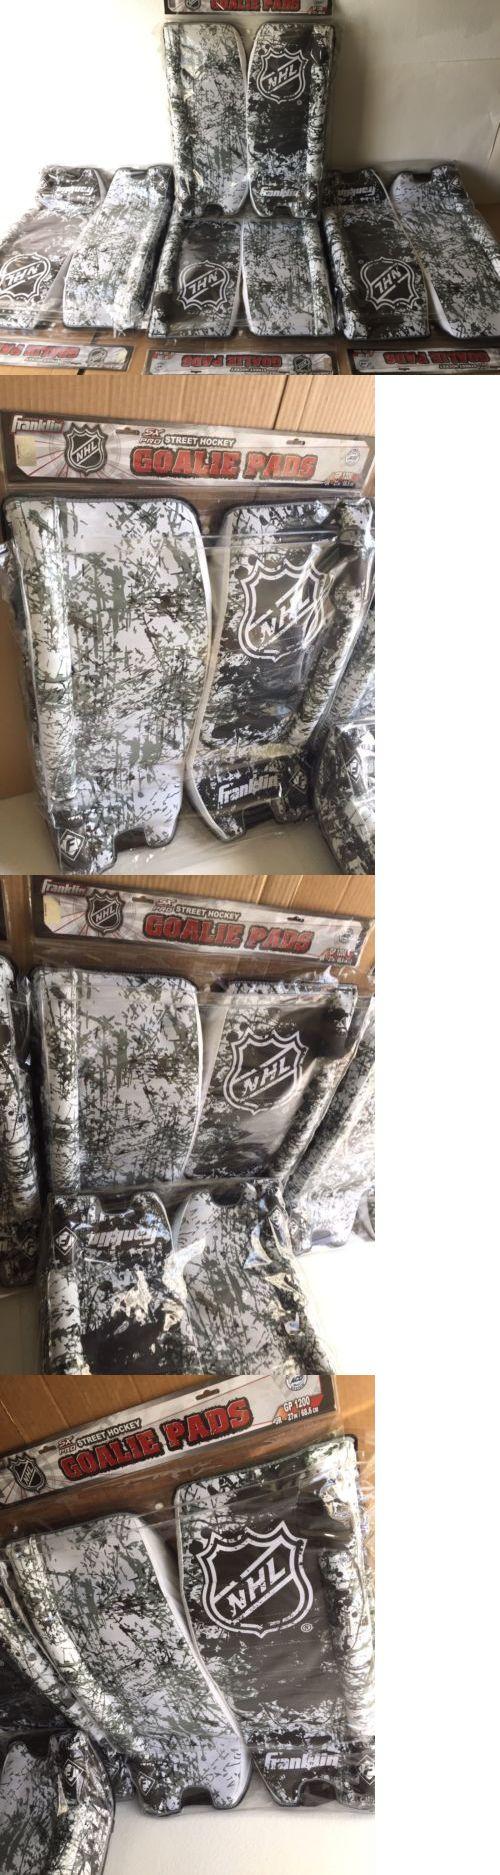 Leg Pads 79764: Street Hockey Goalie Pads, (Gp 1200 Jr-27In/68.5Cm) -> BUY IT NOW ONLY: $50 on eBay!